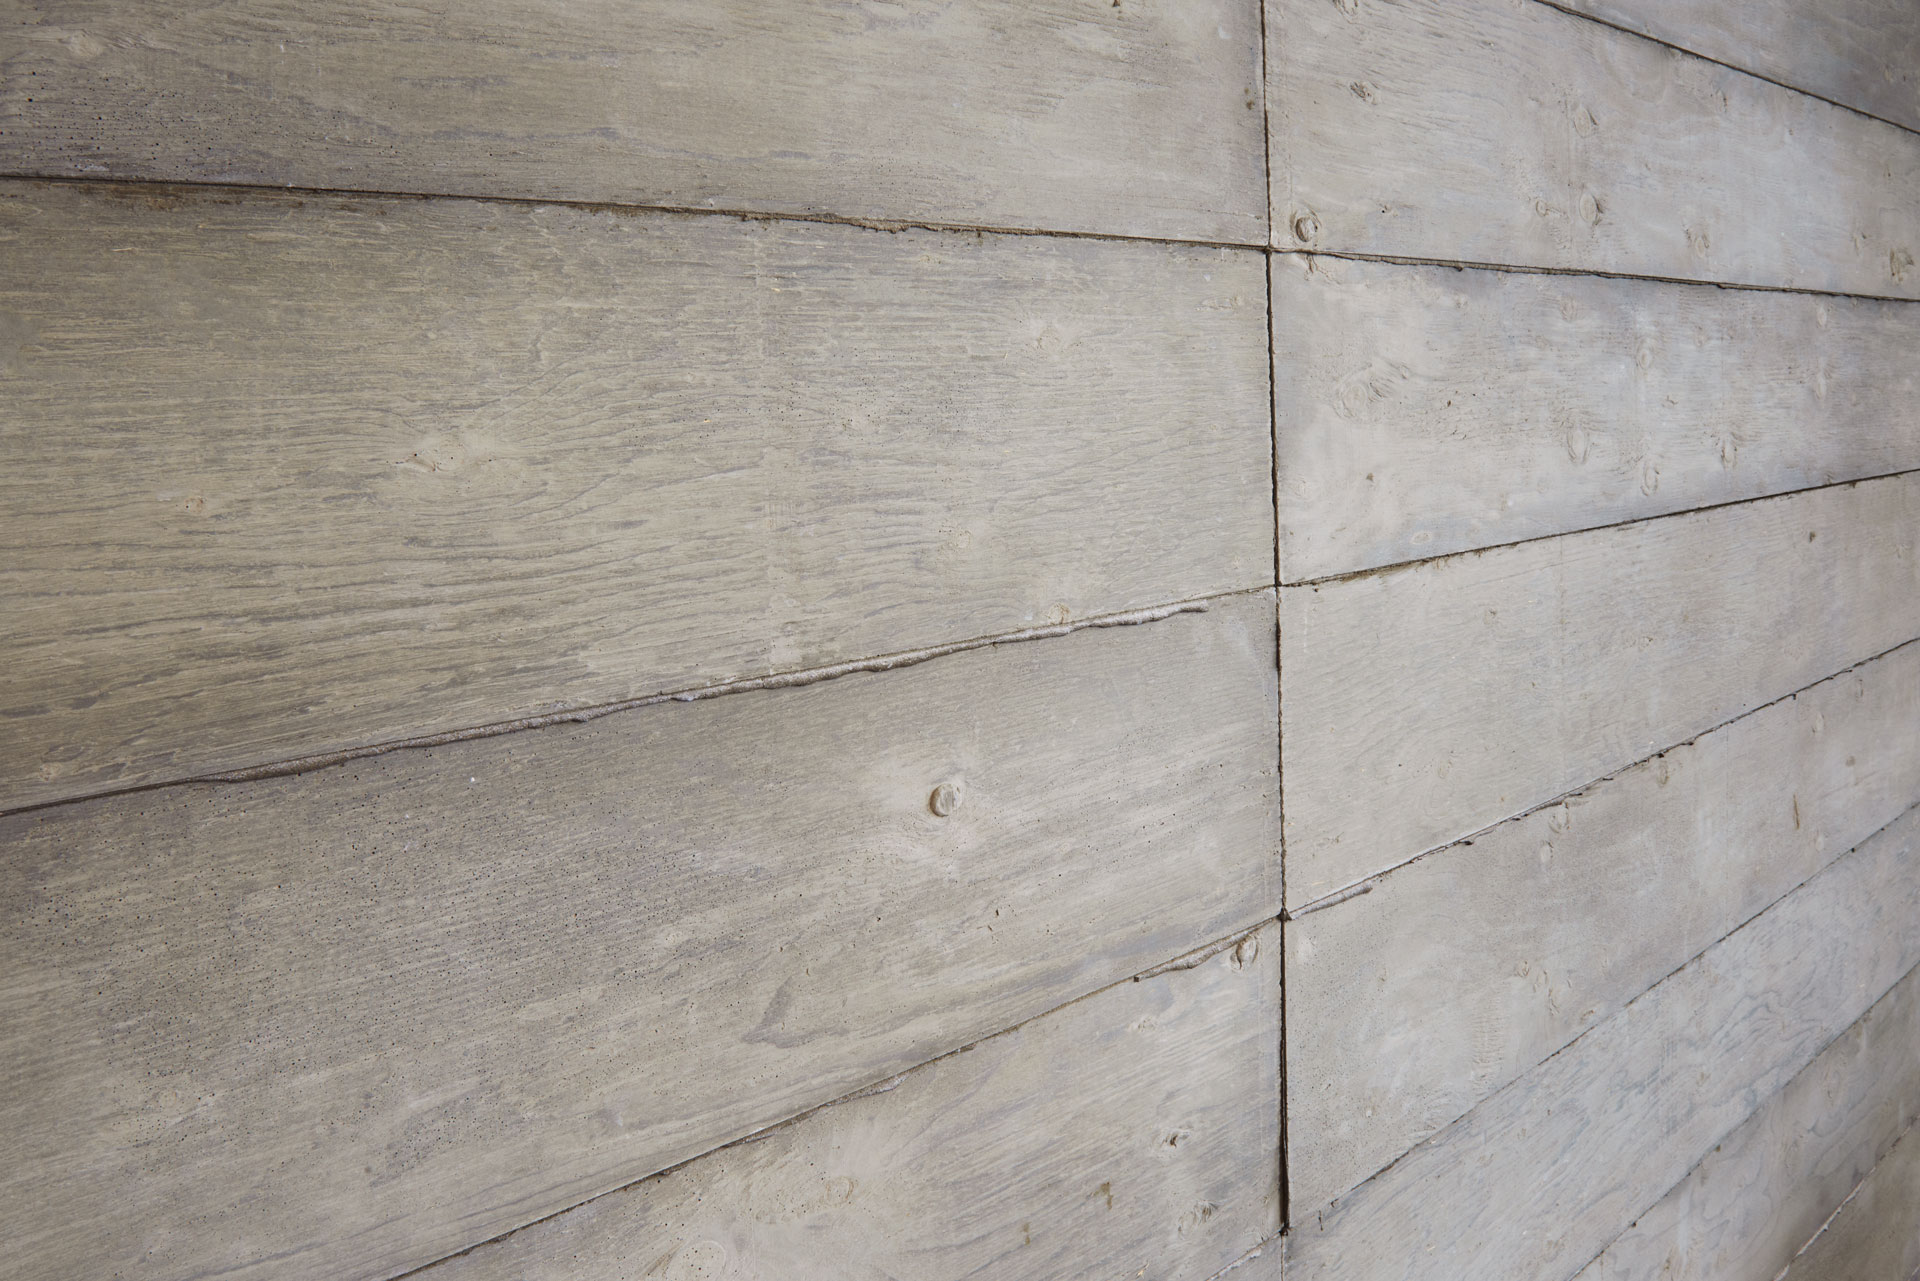 Board Formed Concrete Wall Panels Concrete Wall Panels Concrete Texture Board Formed Concrete